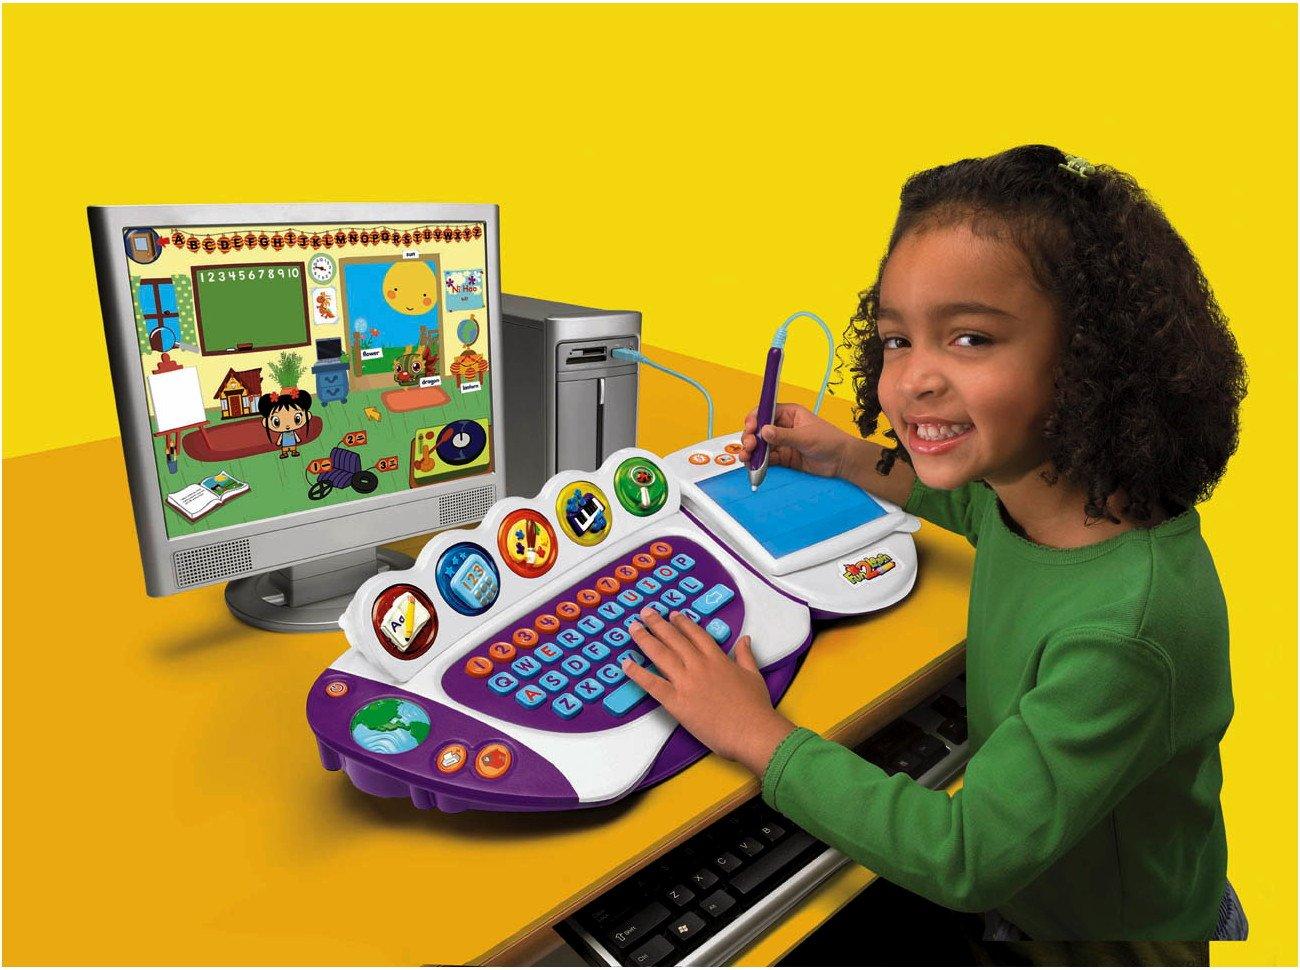 Fun 2 Learn Computer Cool School Software Kai Lan by Fisher-Price